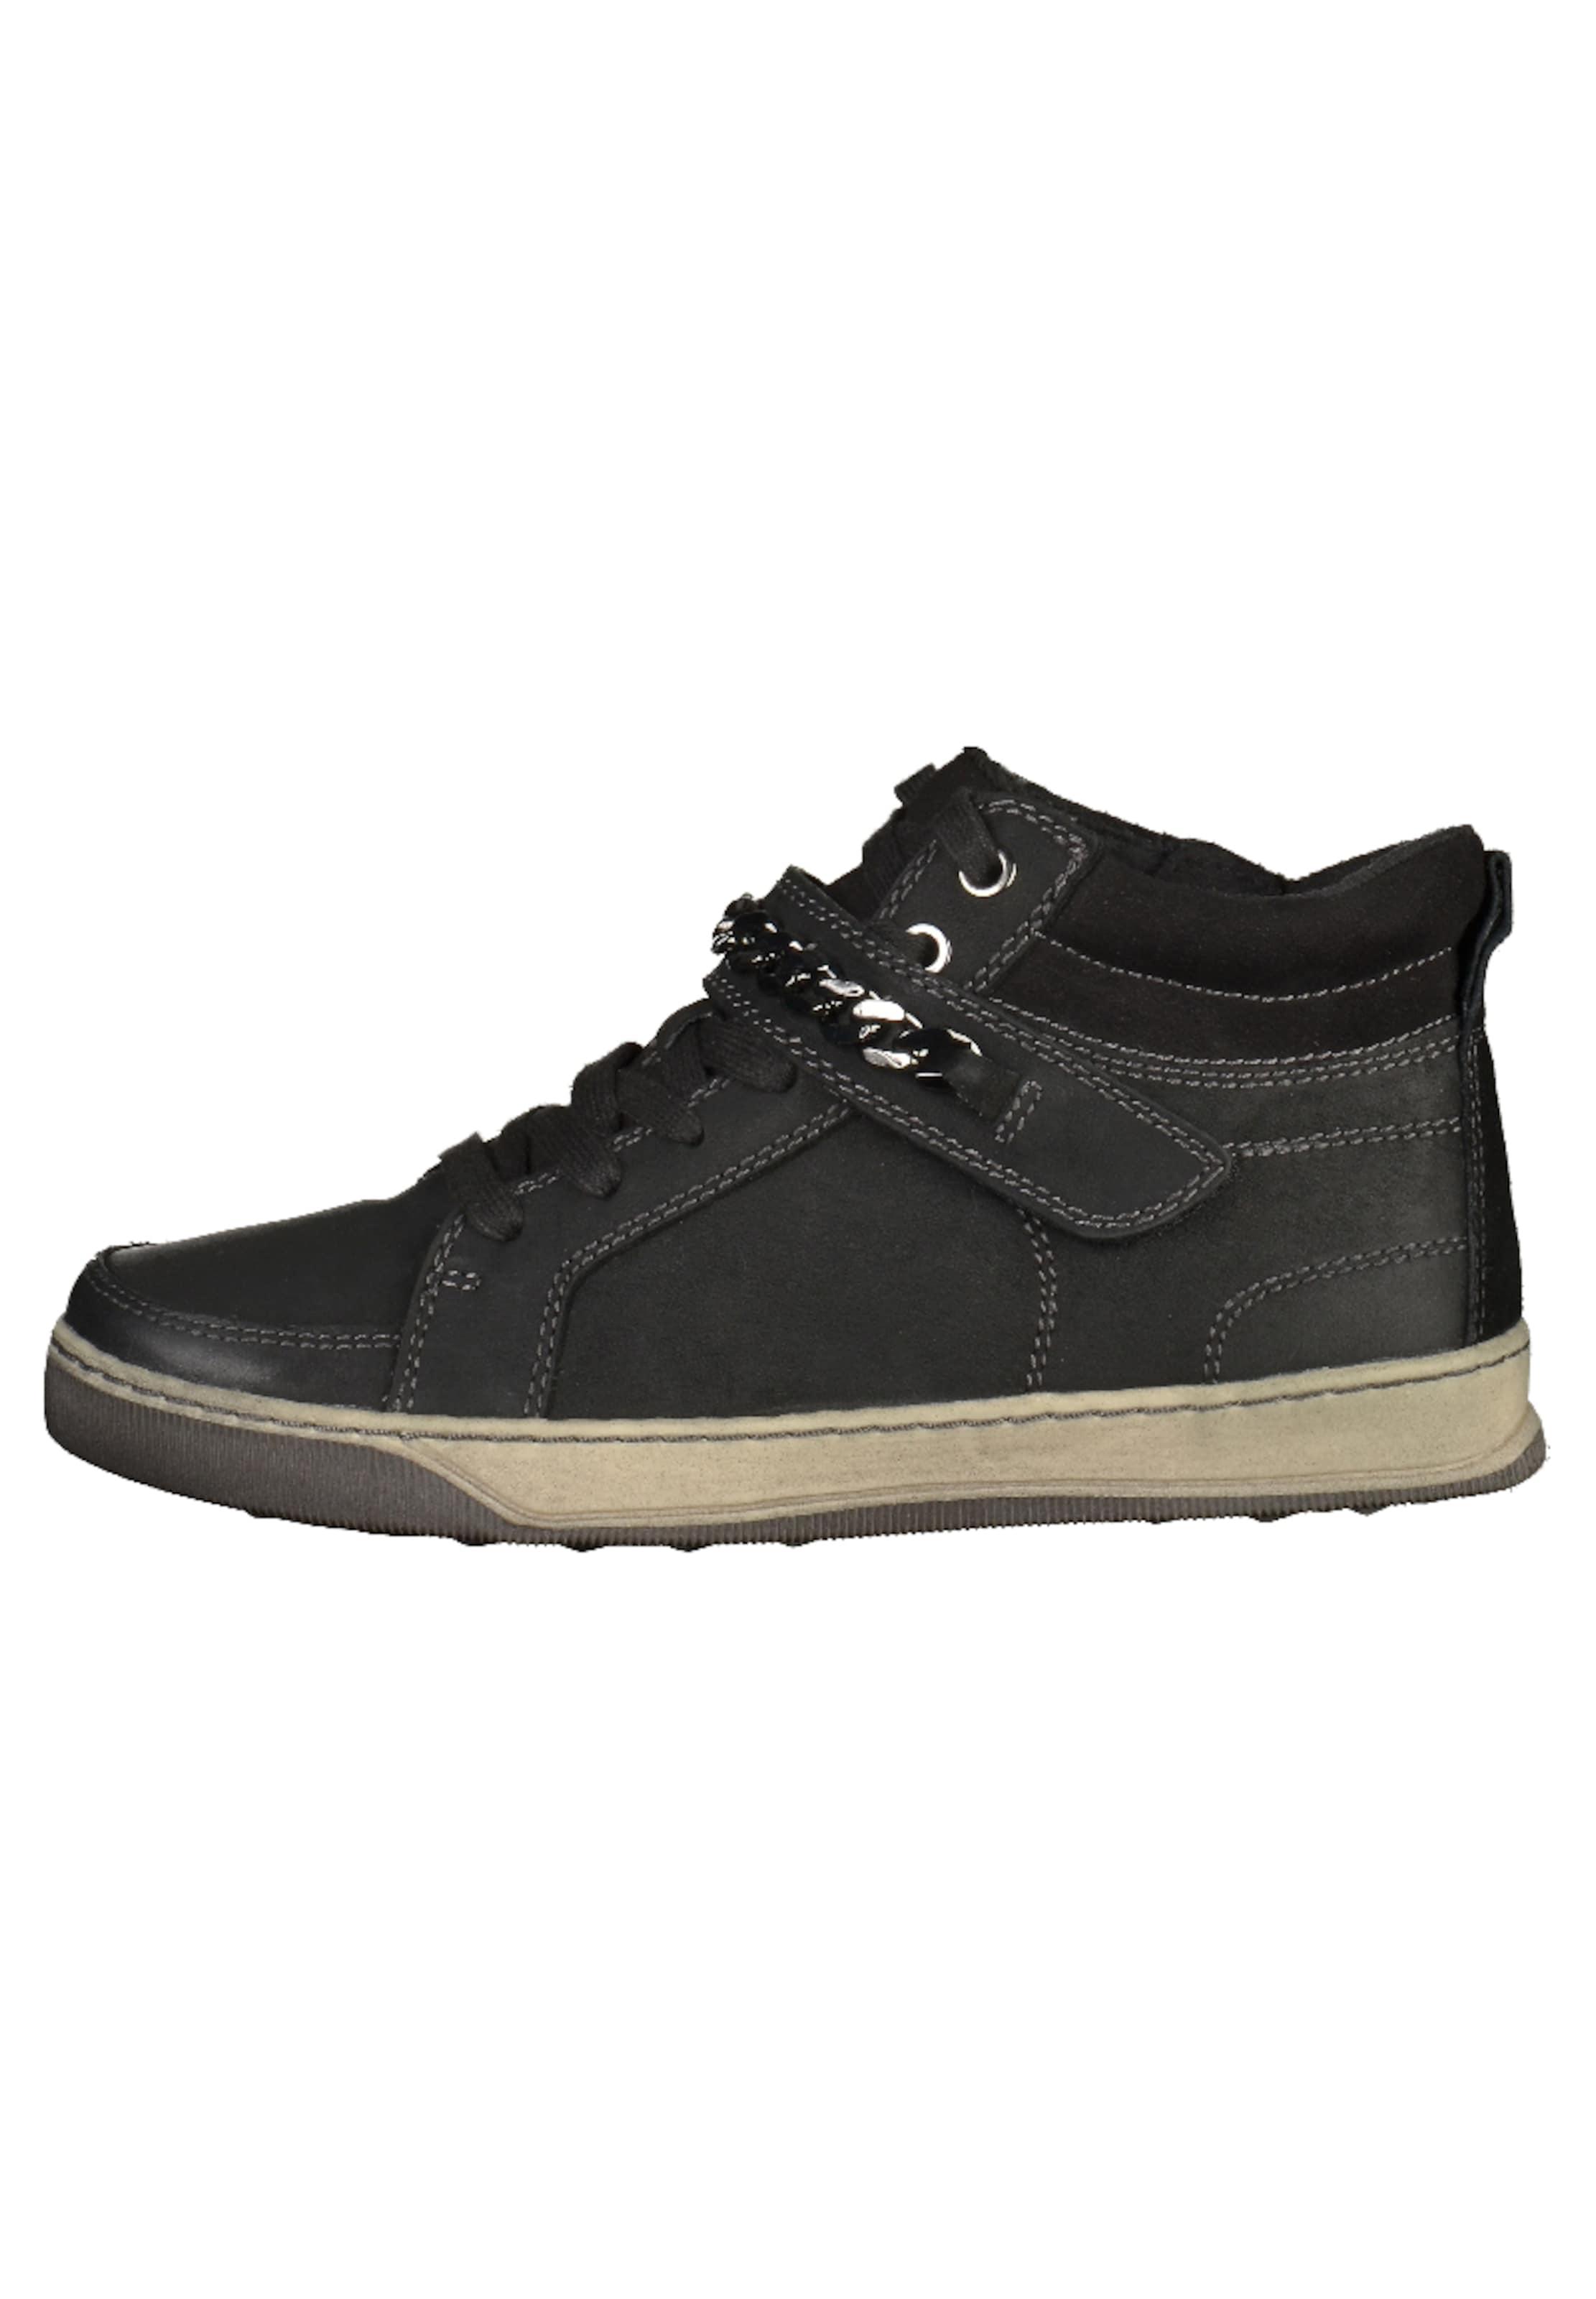 Sneaker Tamaris In Schwarz Schwarz In Tamaris Sneaker Tamaris wPknO0